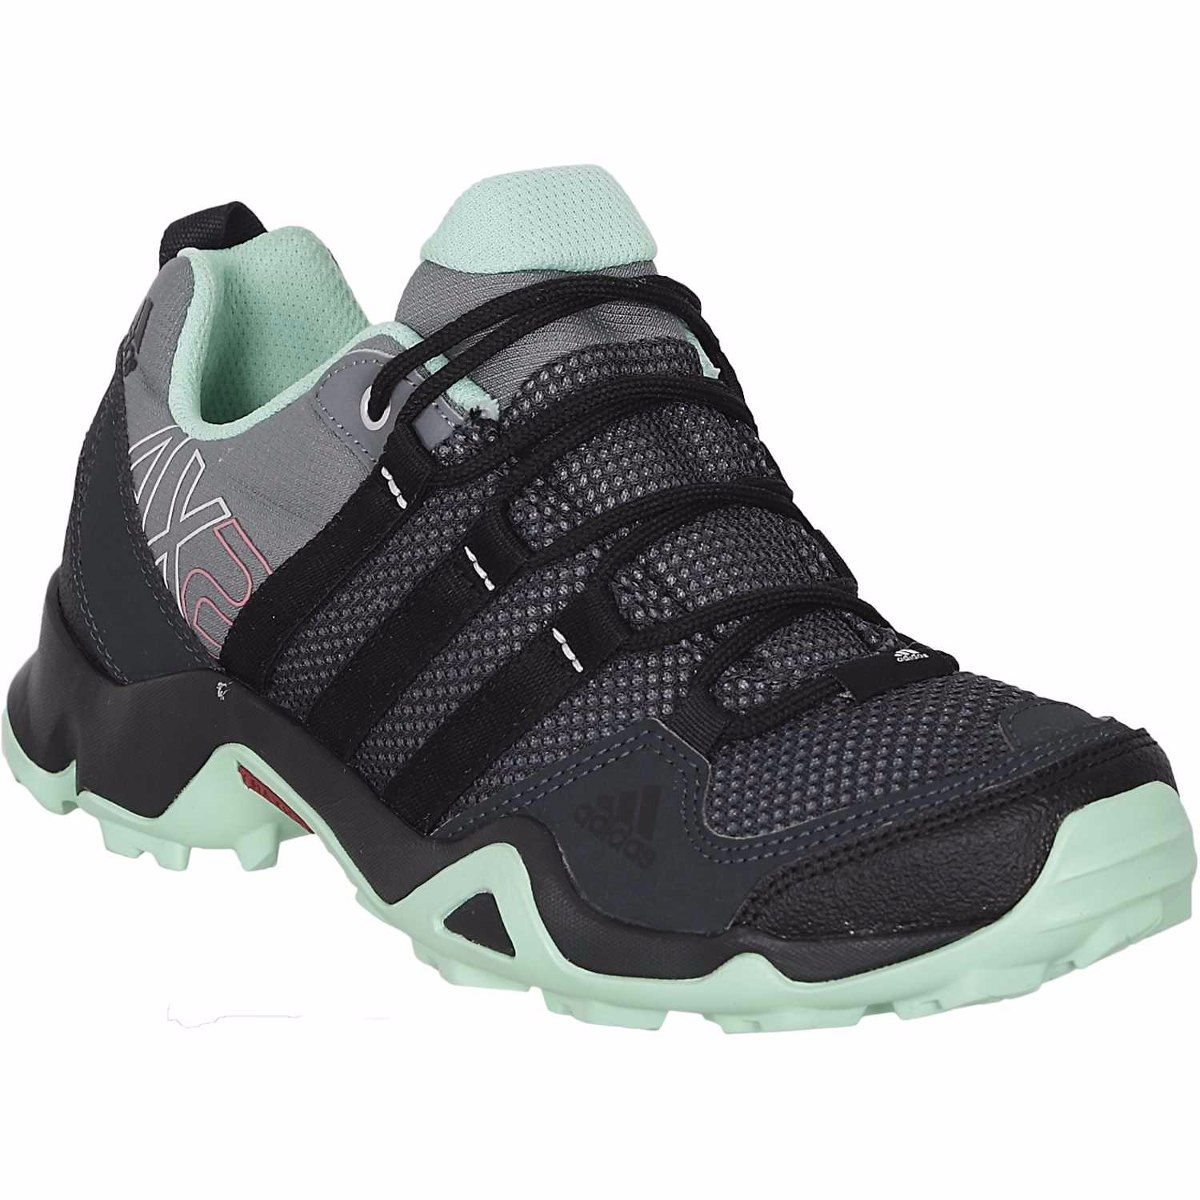 huge discount 1e945 8a7d8 Zapatillas Mujer, Zapatos, Verde, Negro, Moda Deportiva, Mujeres, Plantilla,